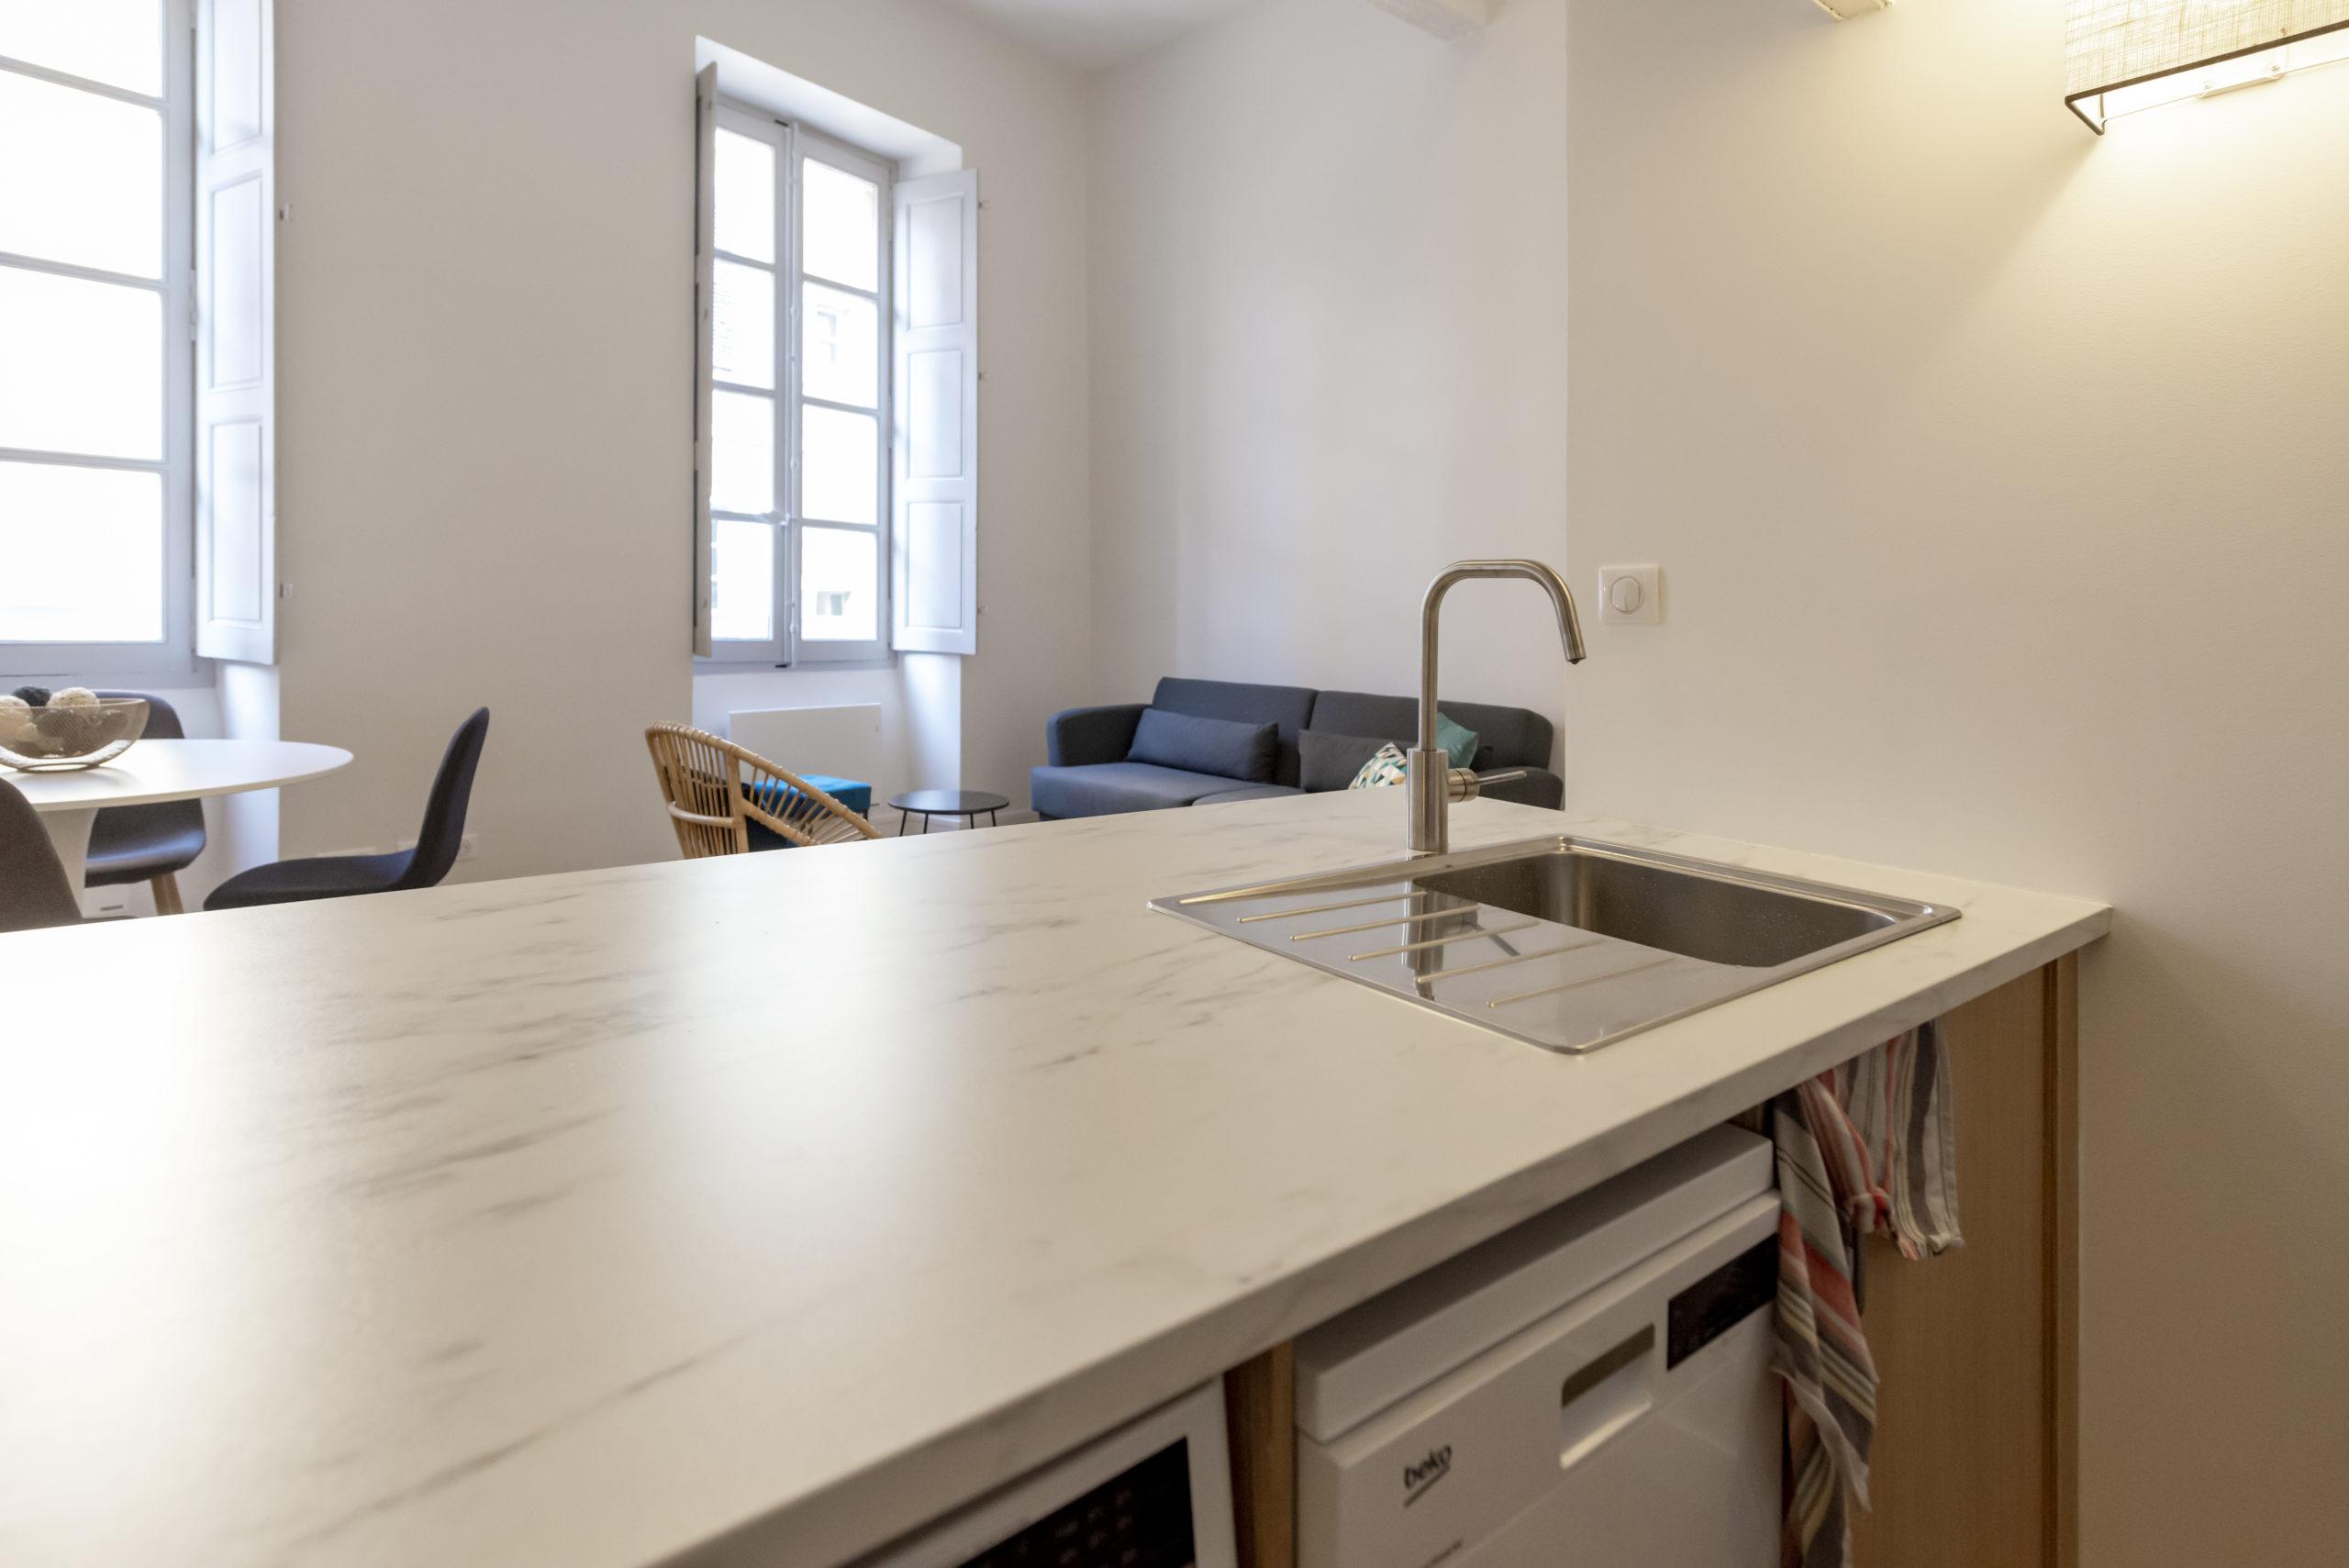 05-renovation-cuisine-studio-mezzanine